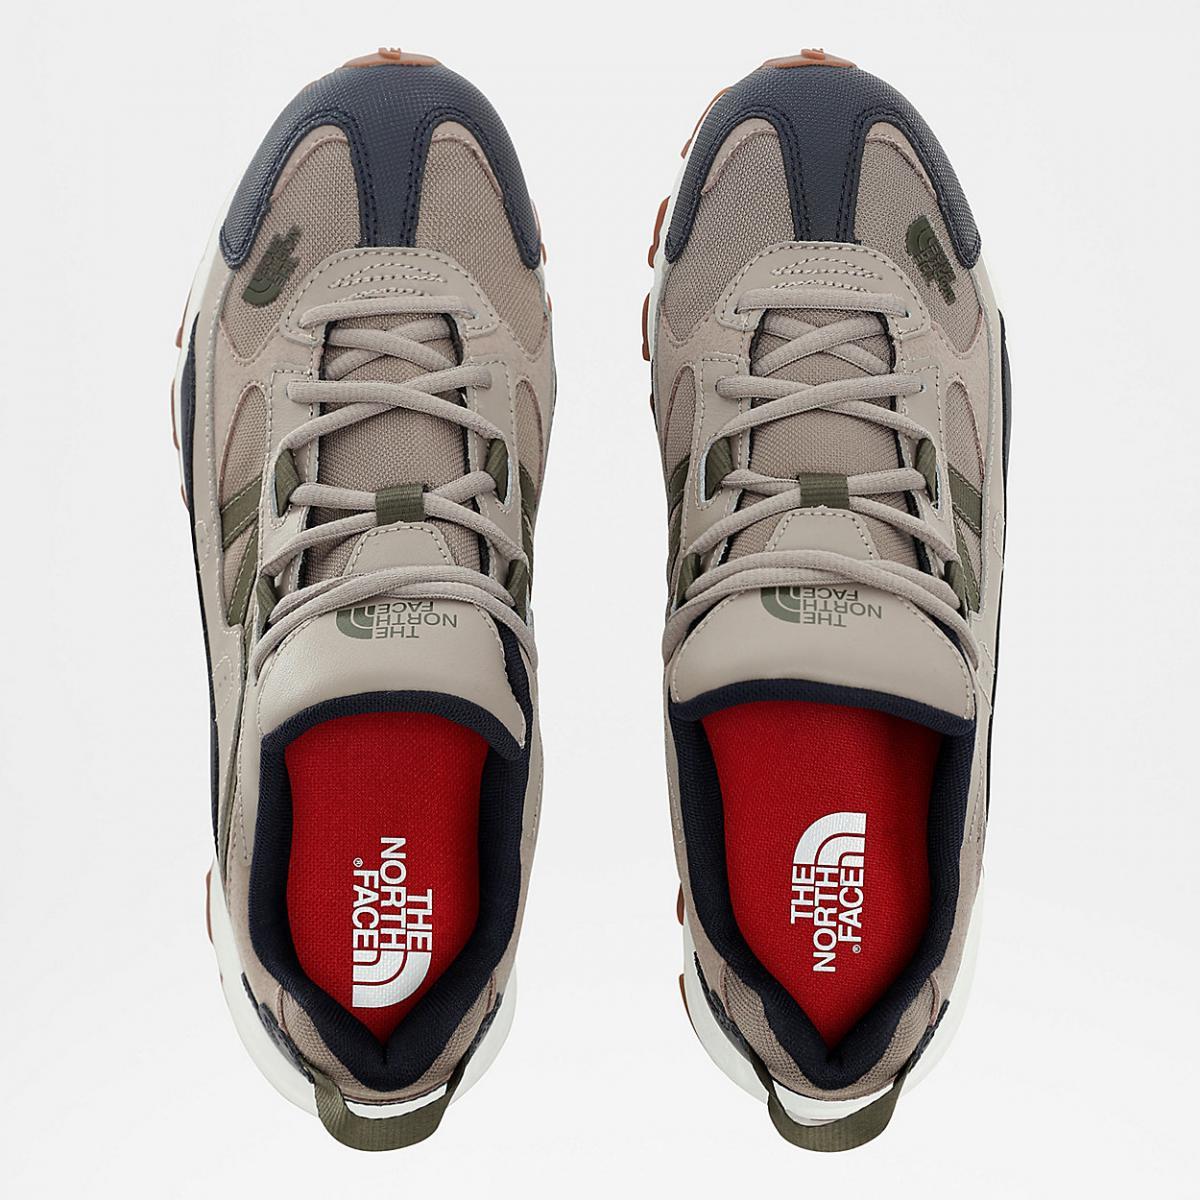 Męskie buty trailowe The North Face Fire Road vintage khaki/urban navy